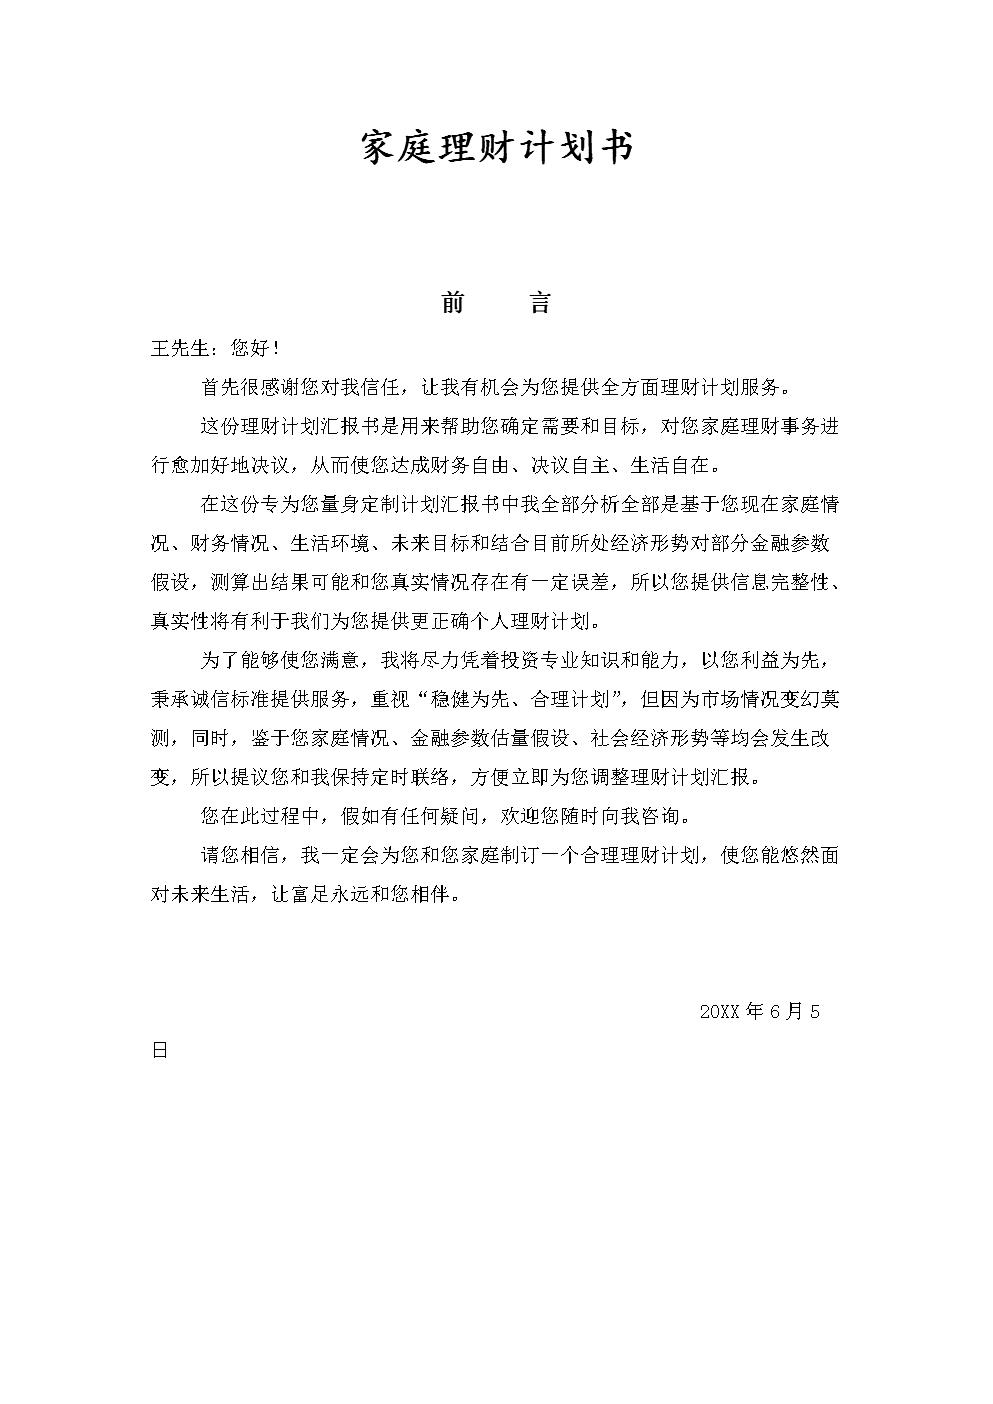 家庭理财规划方案书.doc